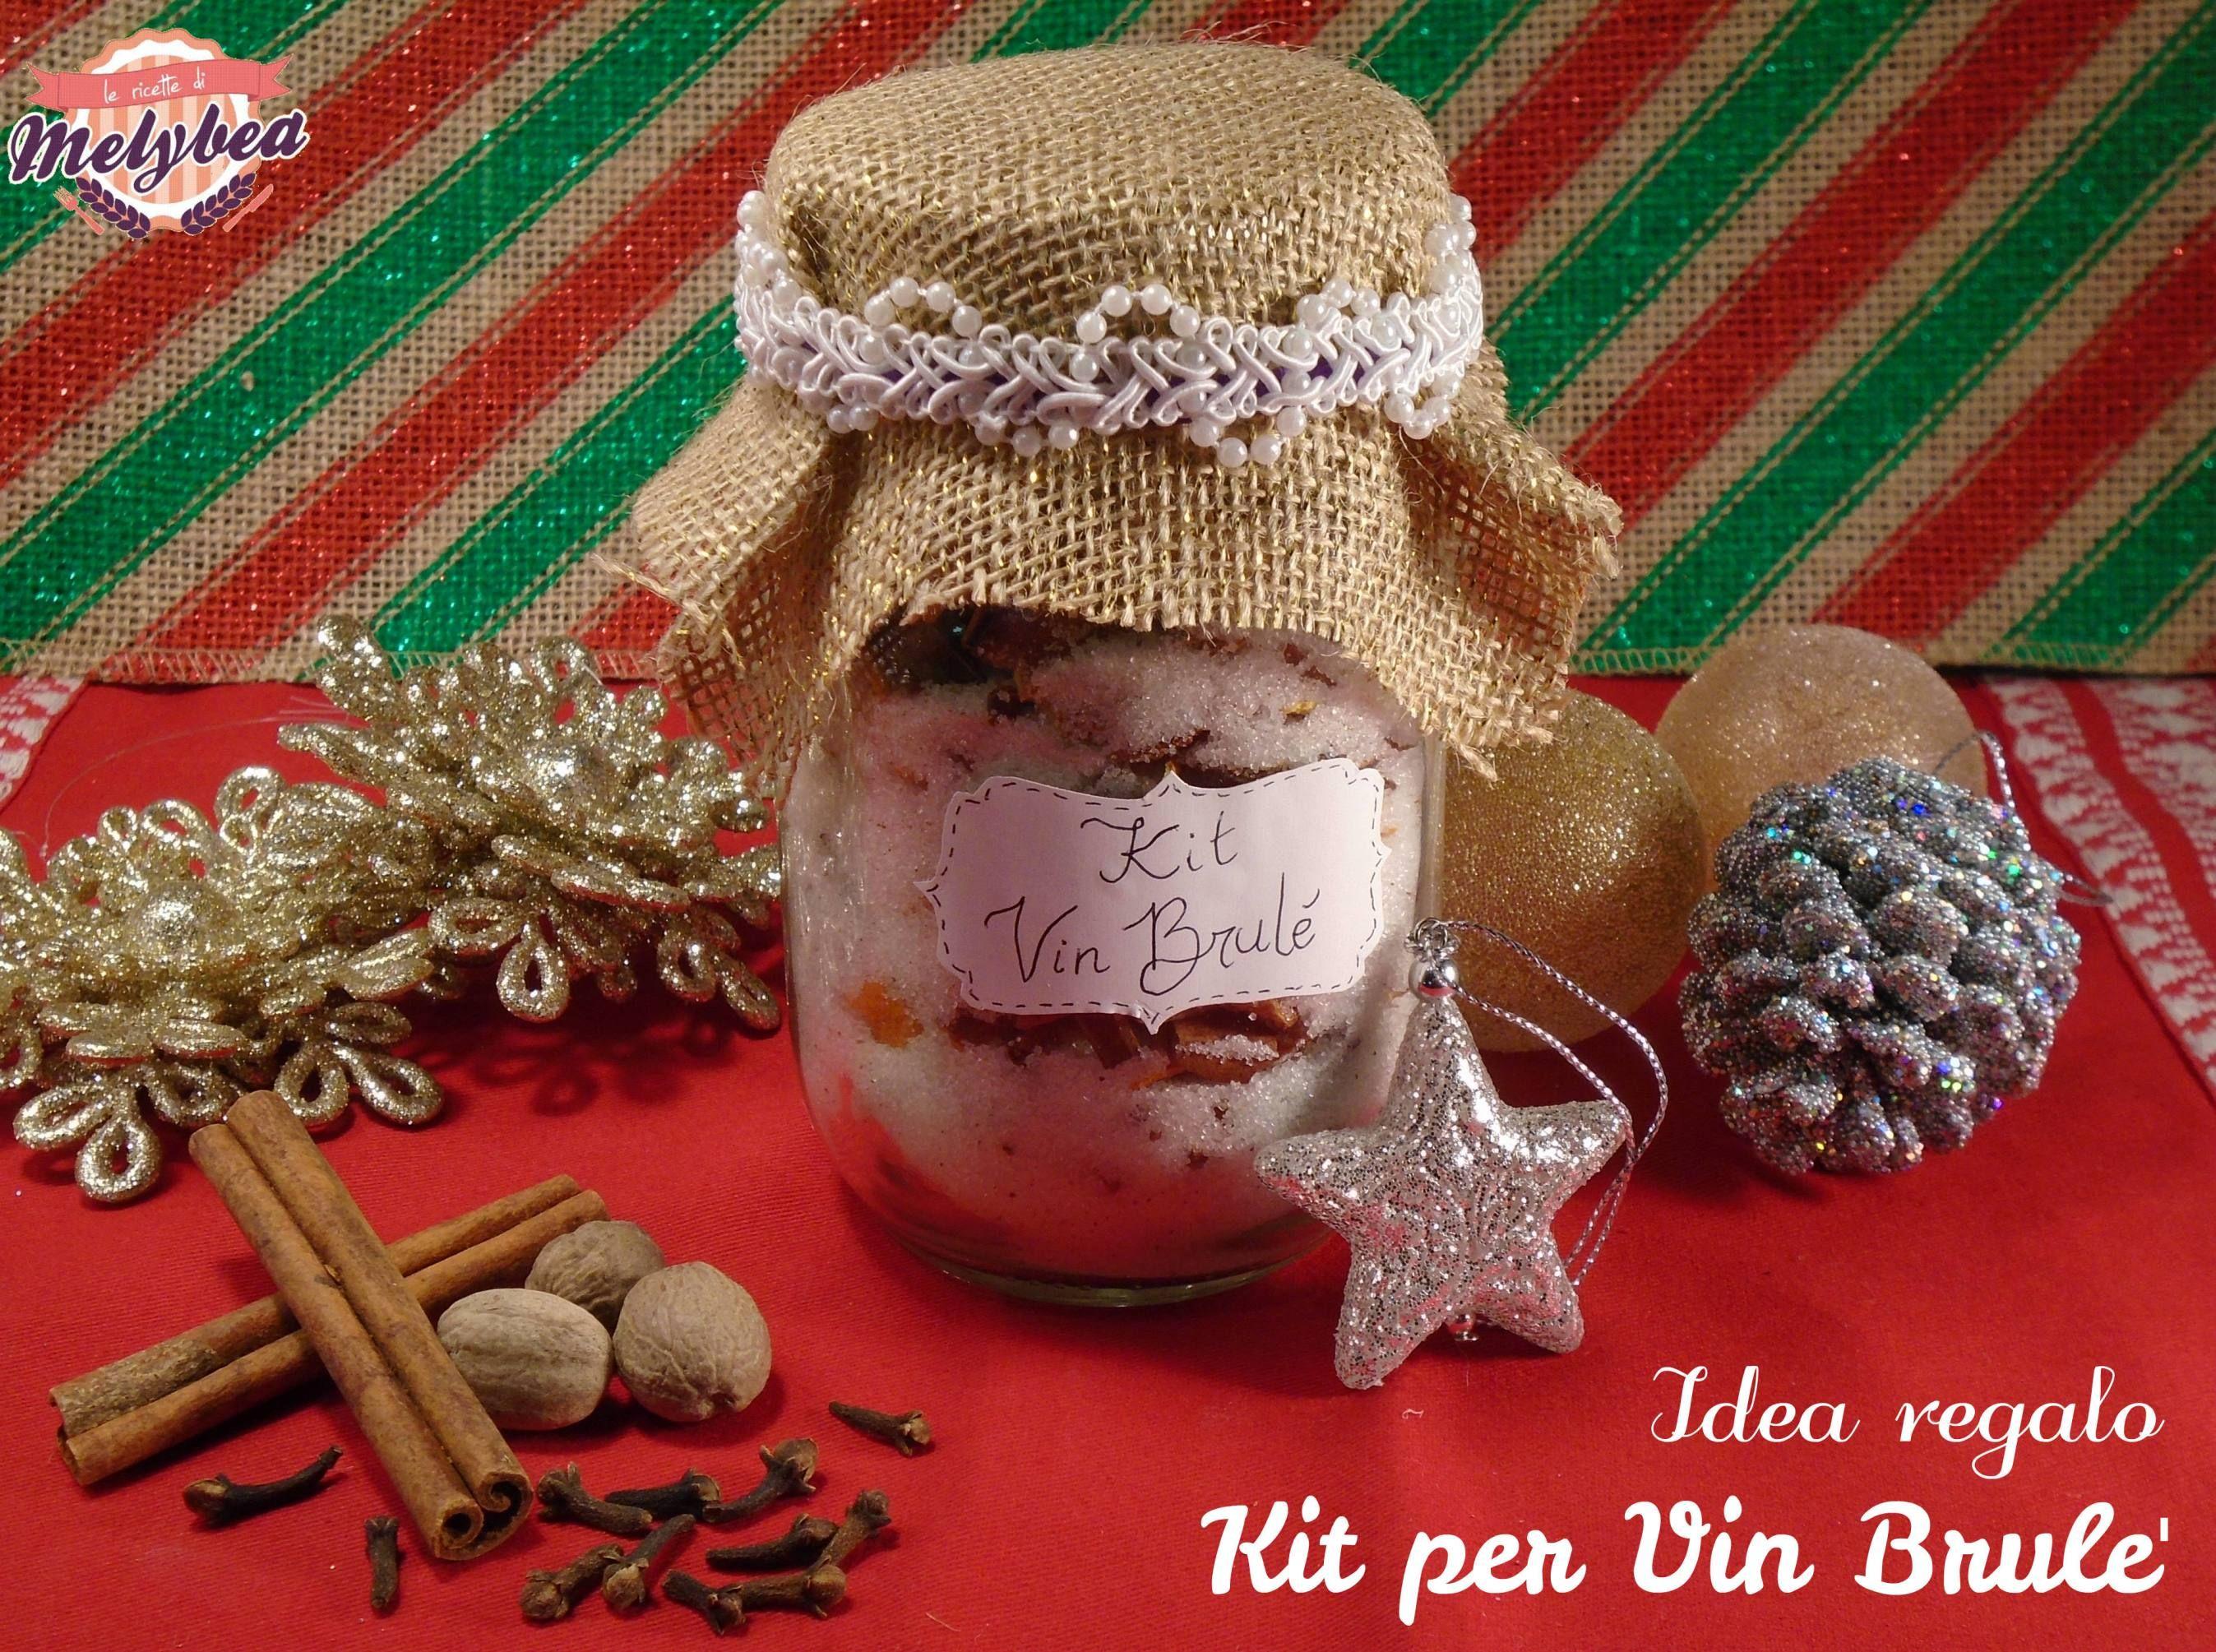 Idee Regalo Amici Natale.Kit Per Vin Brule Idea Regalo Natale Idee Regalo Di